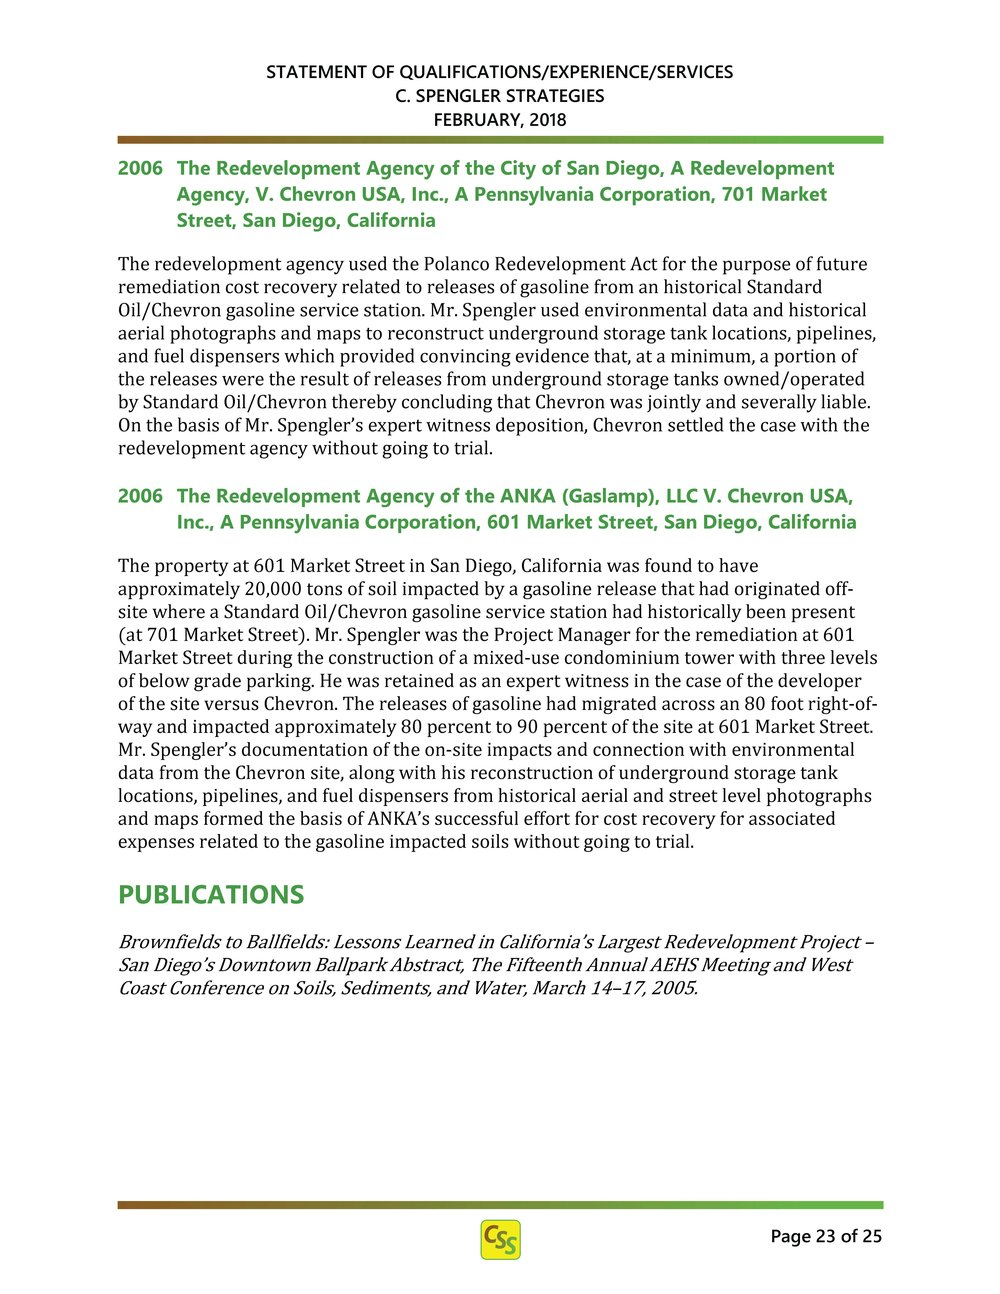 C.Spengler Strategies SOQ.2.13.18_Page_24.jpg